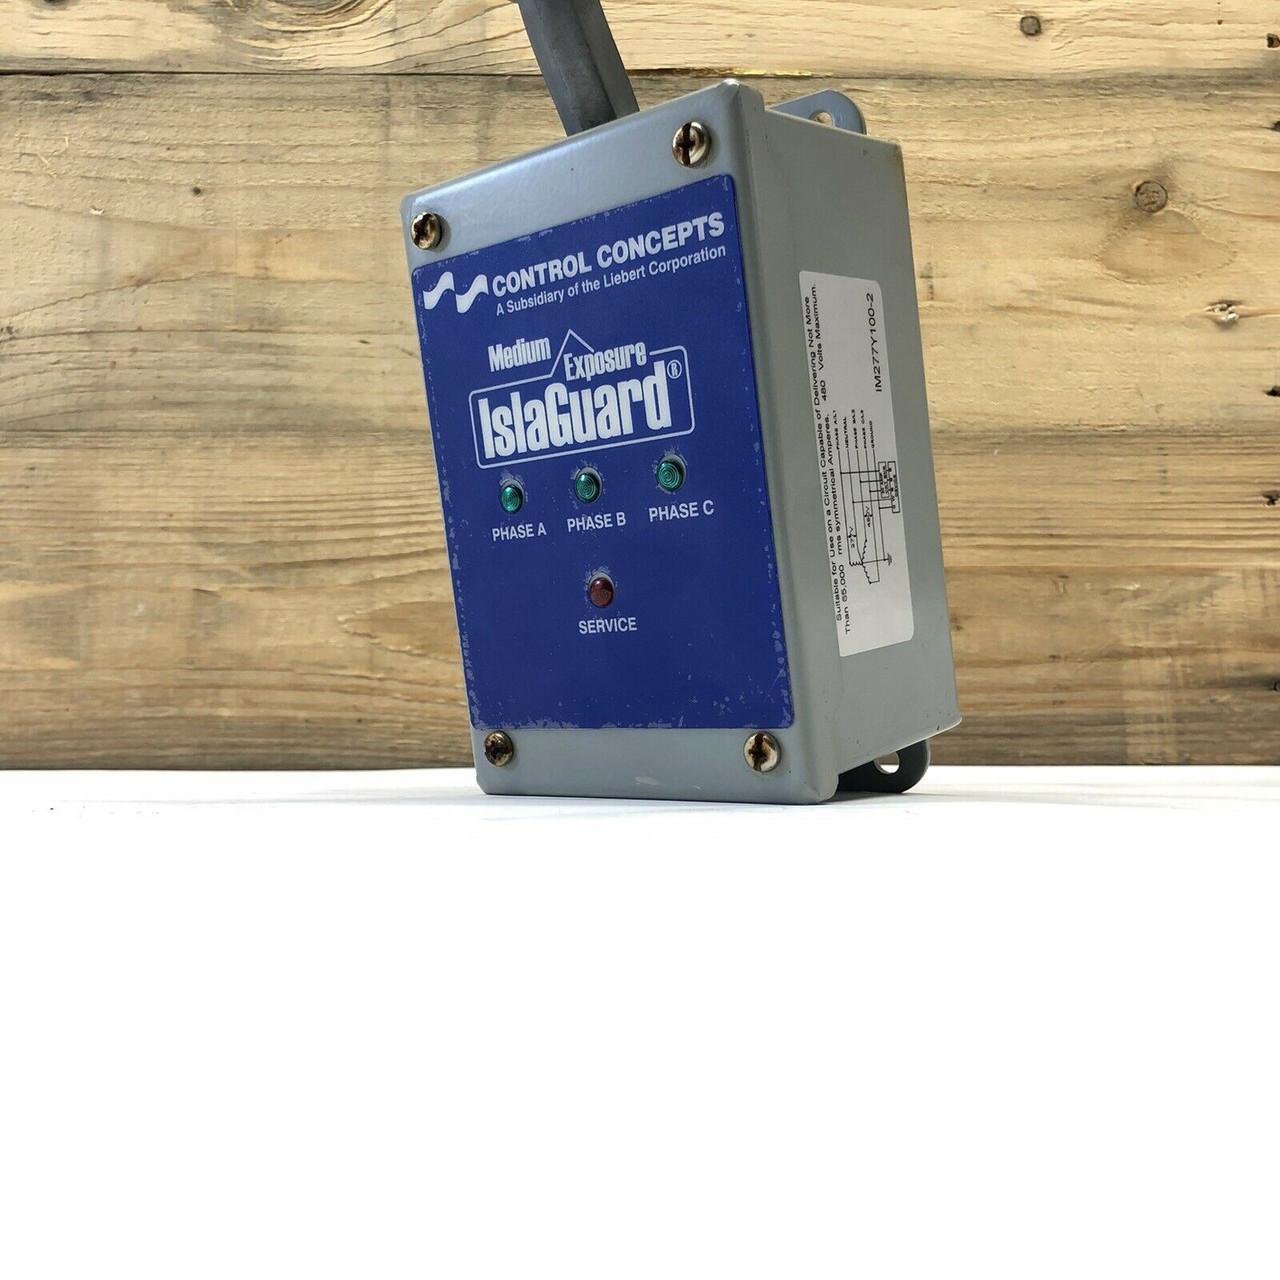 Medium Exposure Islaguard IM277Y100-2 Control Concepts 277/480V 3-Phase Wye